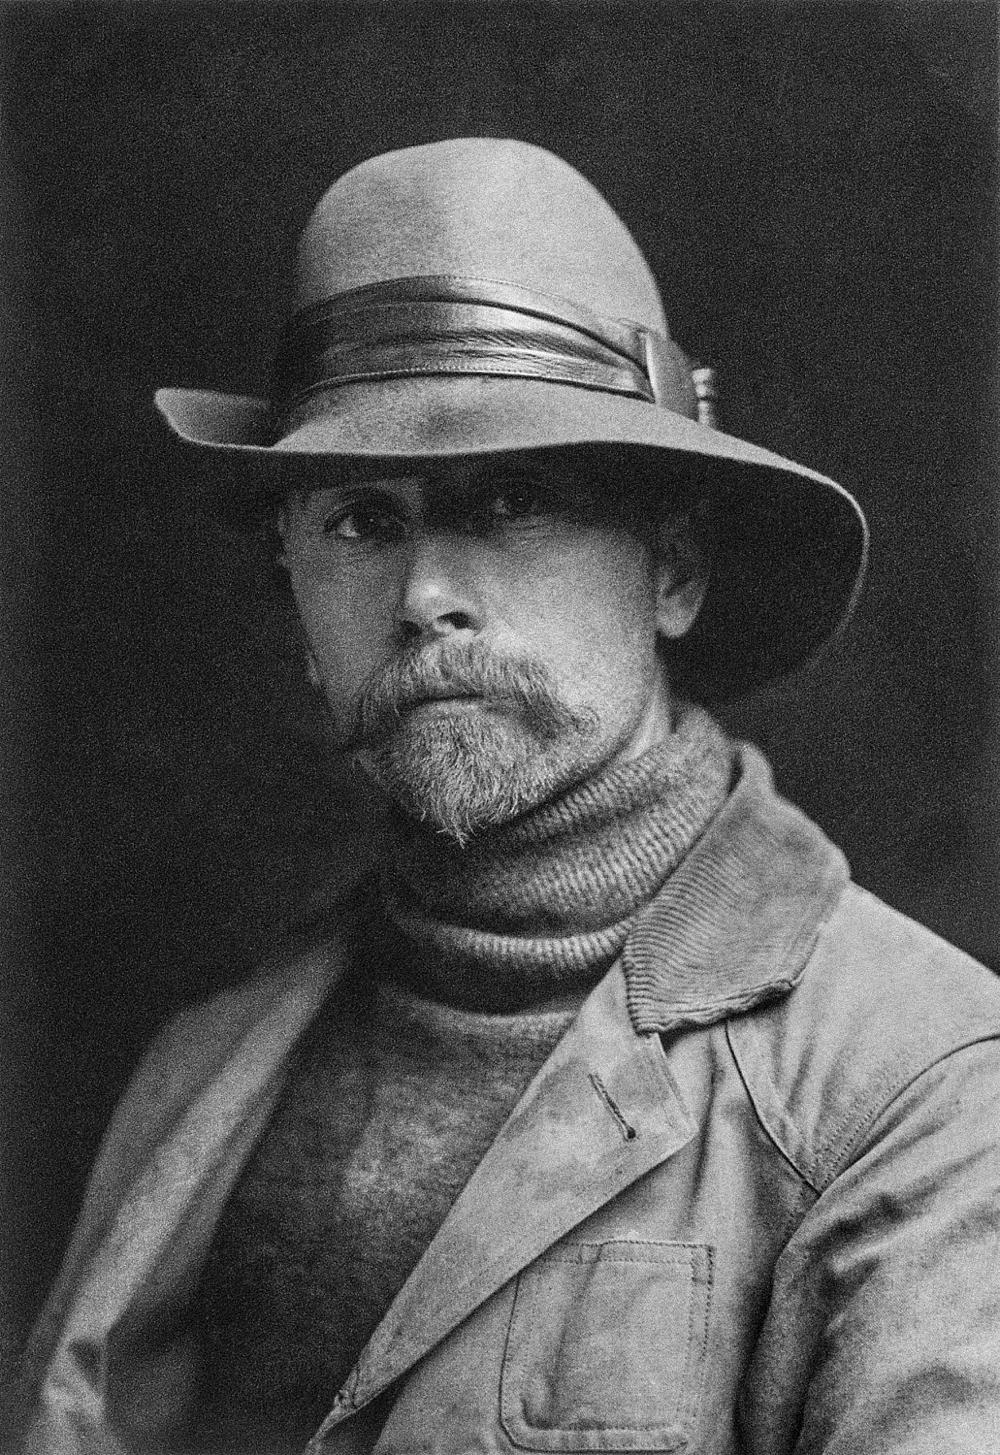 Self-Portrait of Edward S. Curtis 1868-1952